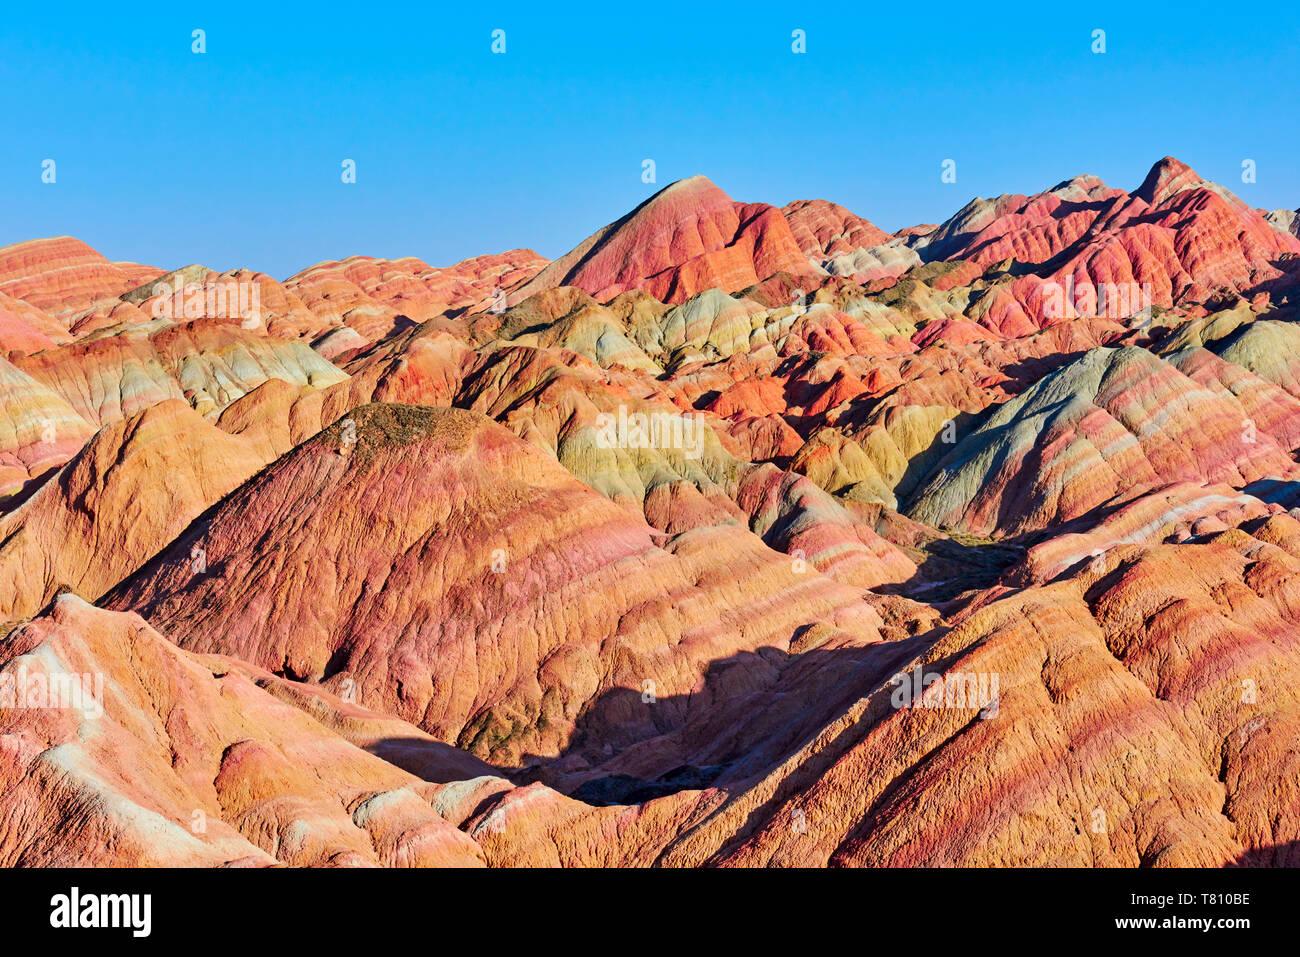 Colorful Danxia landform in Zhangye, UNESCO World Heritage Site, Gansu Province, China, Asia - Stock Image